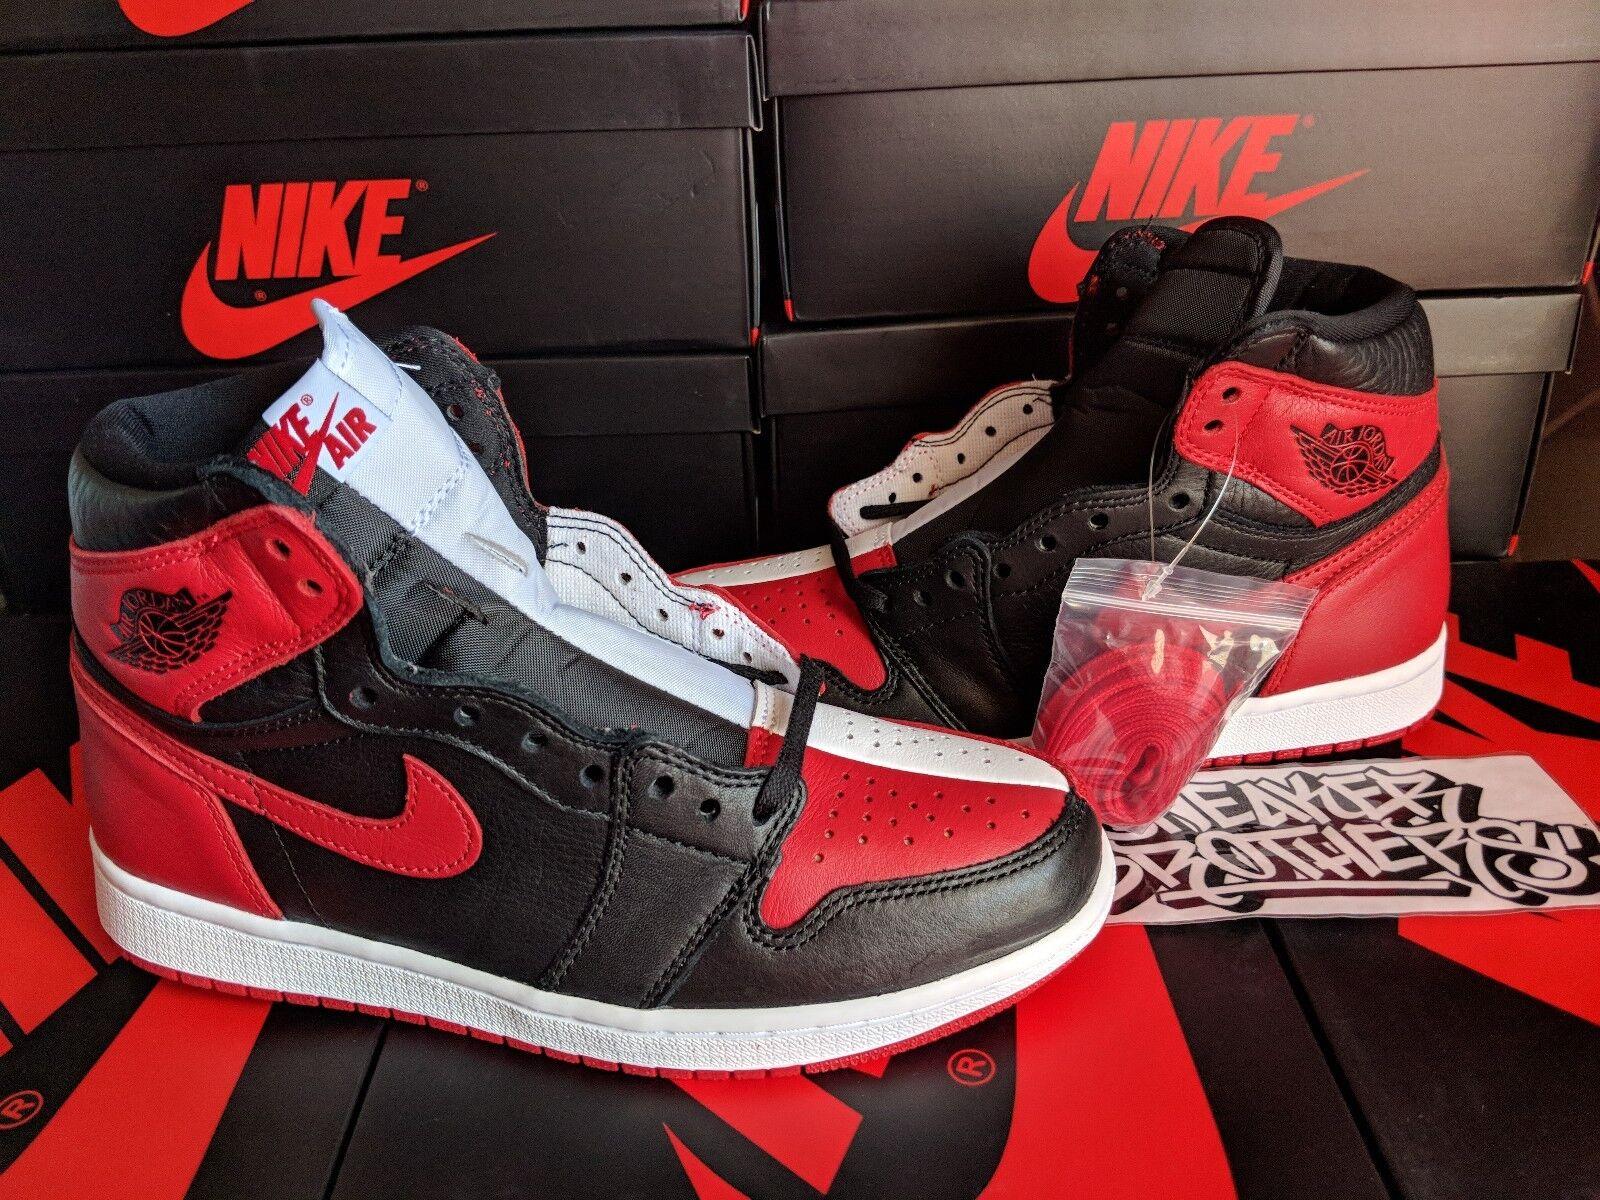 Nike Air Jordan Retro I 1 High OG NRG 2018 Red Homage To Home H2H Red 2018 861428-061 0fda68